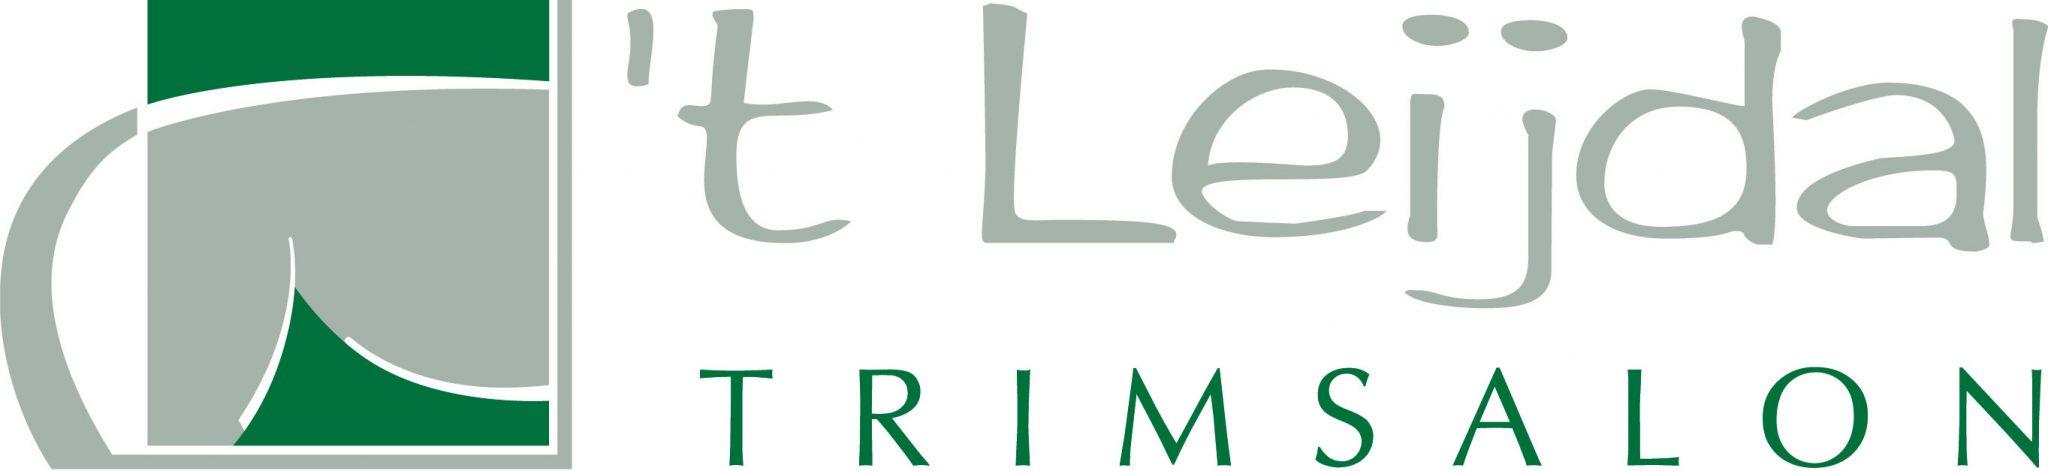 Logo trimsalon Leijdal Chaam